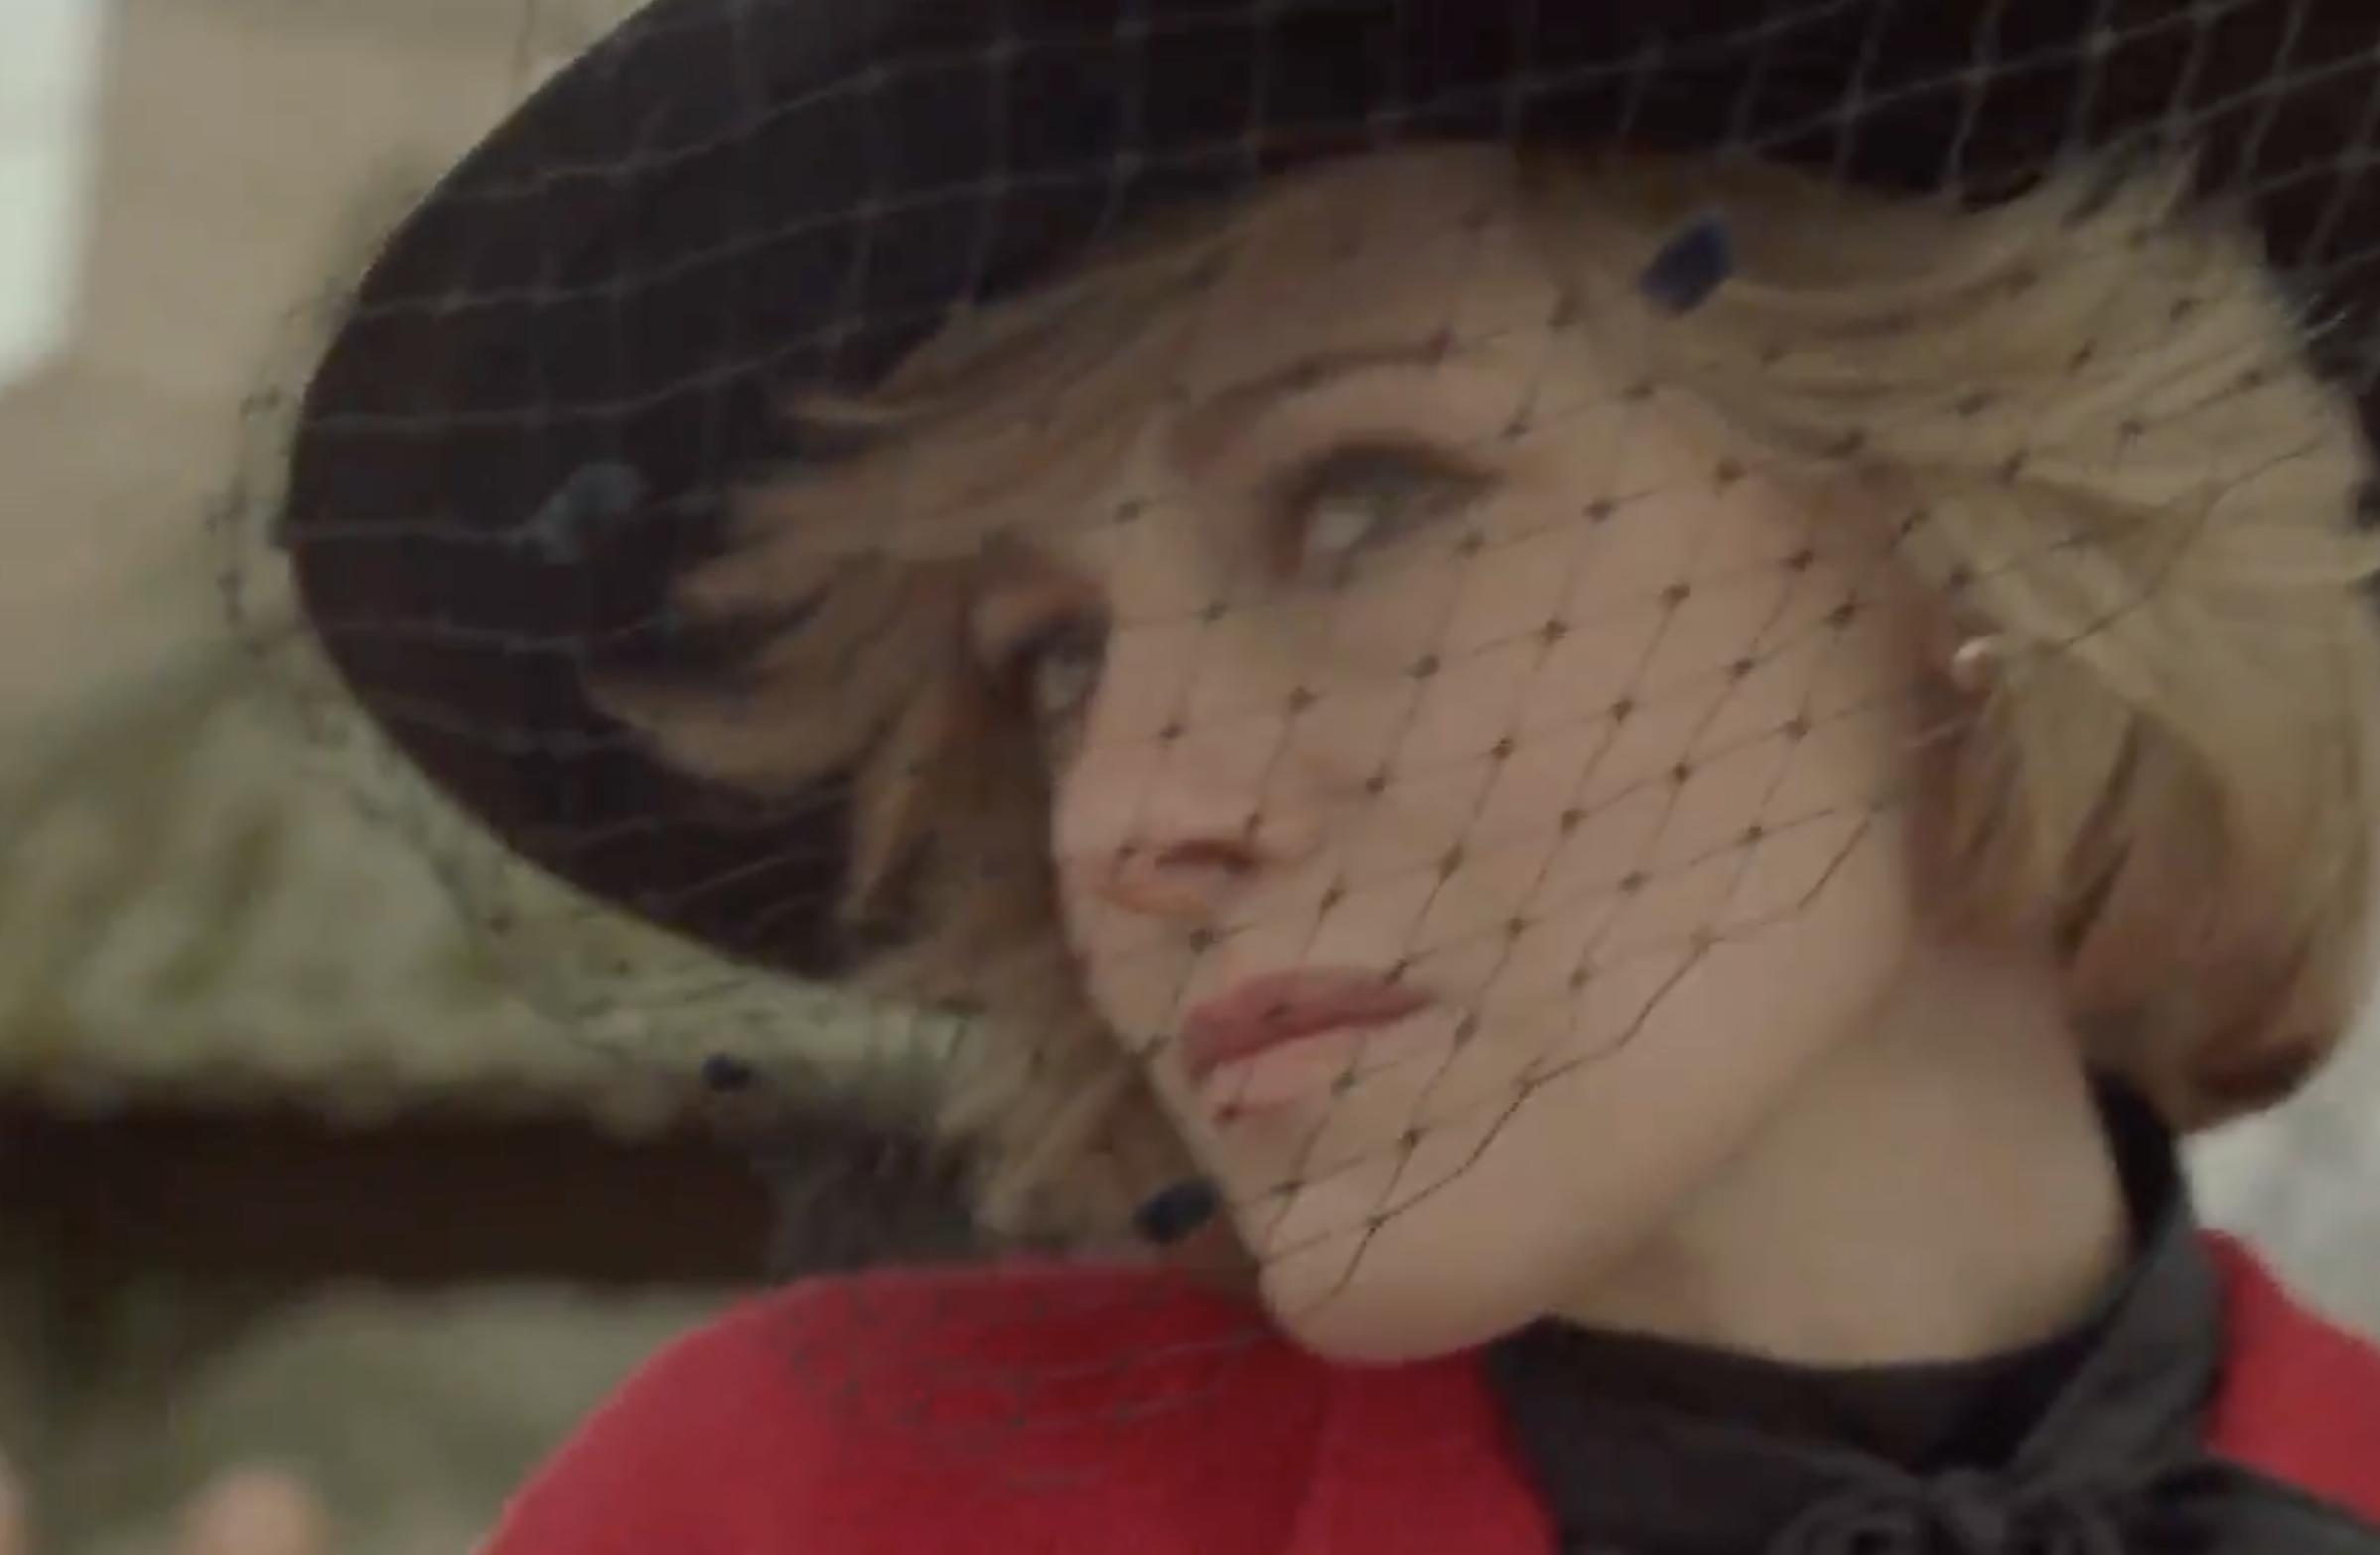 Kristen as Diana wearing a wide-brim black hat with birdcage veil